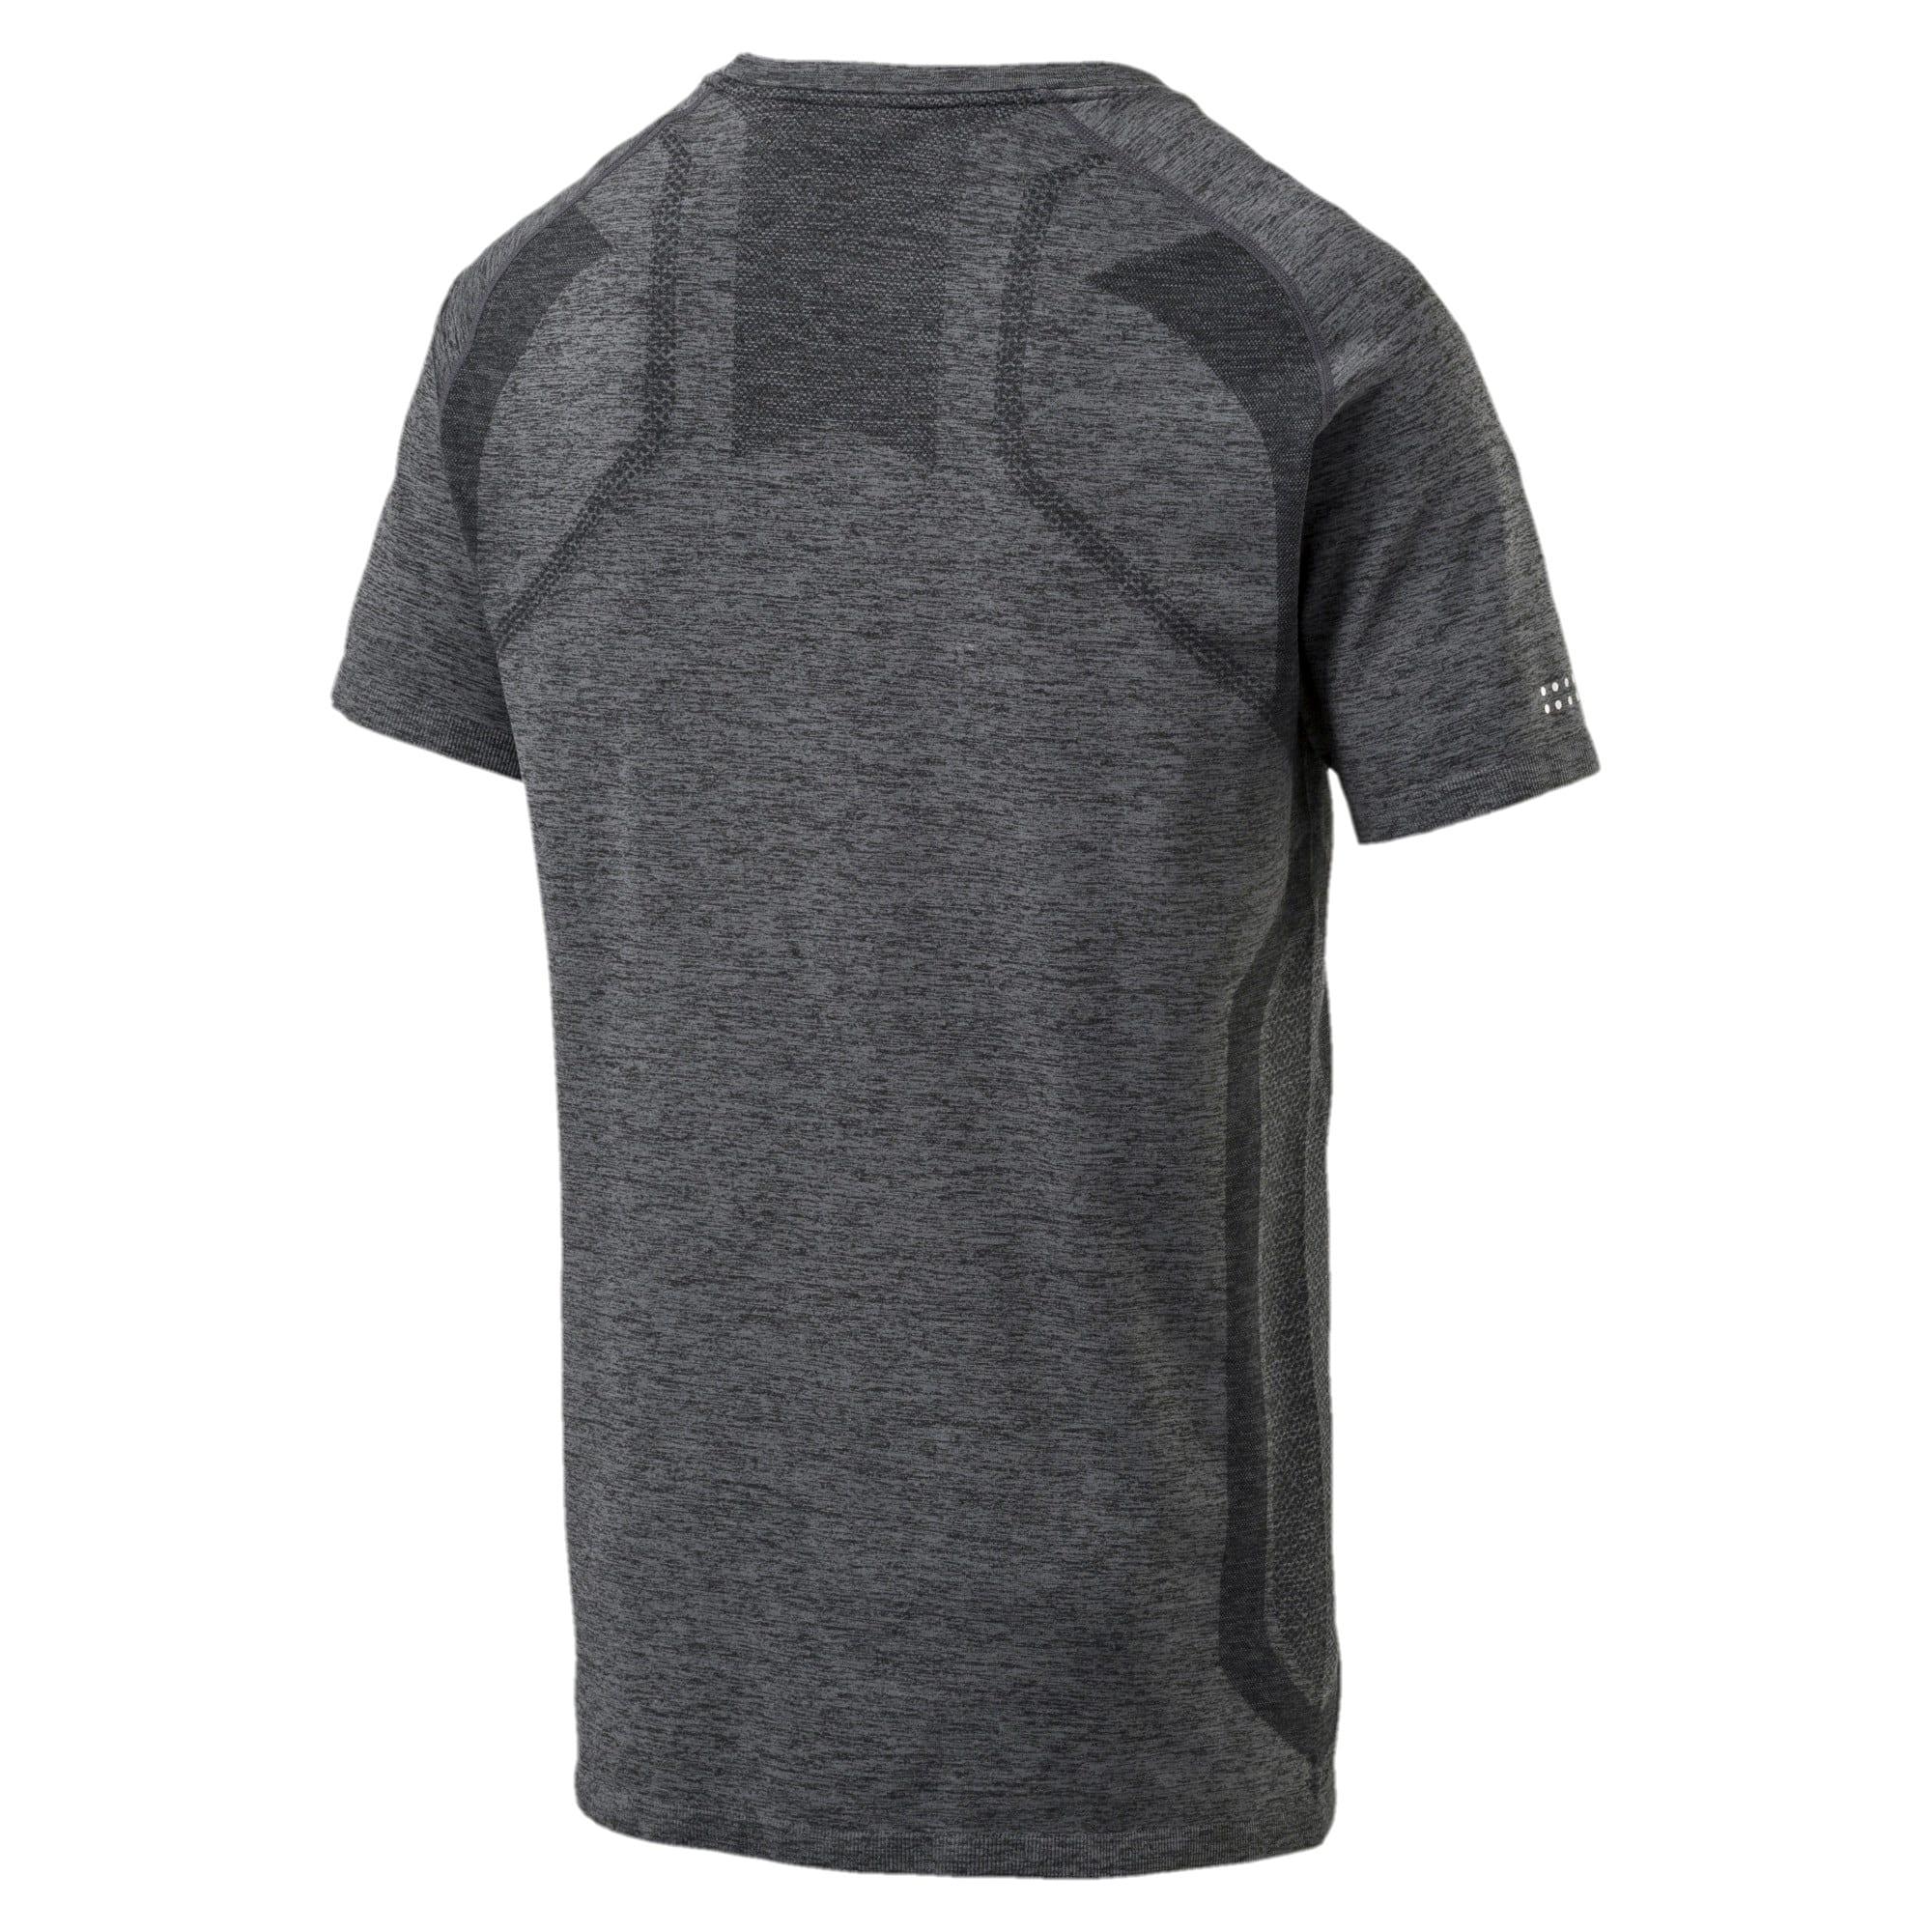 Thumbnail 2 of PWRRUN evoKNIT Men's Short Sleeve Running T-Shirt, Dark Gray Heather, medium-IND